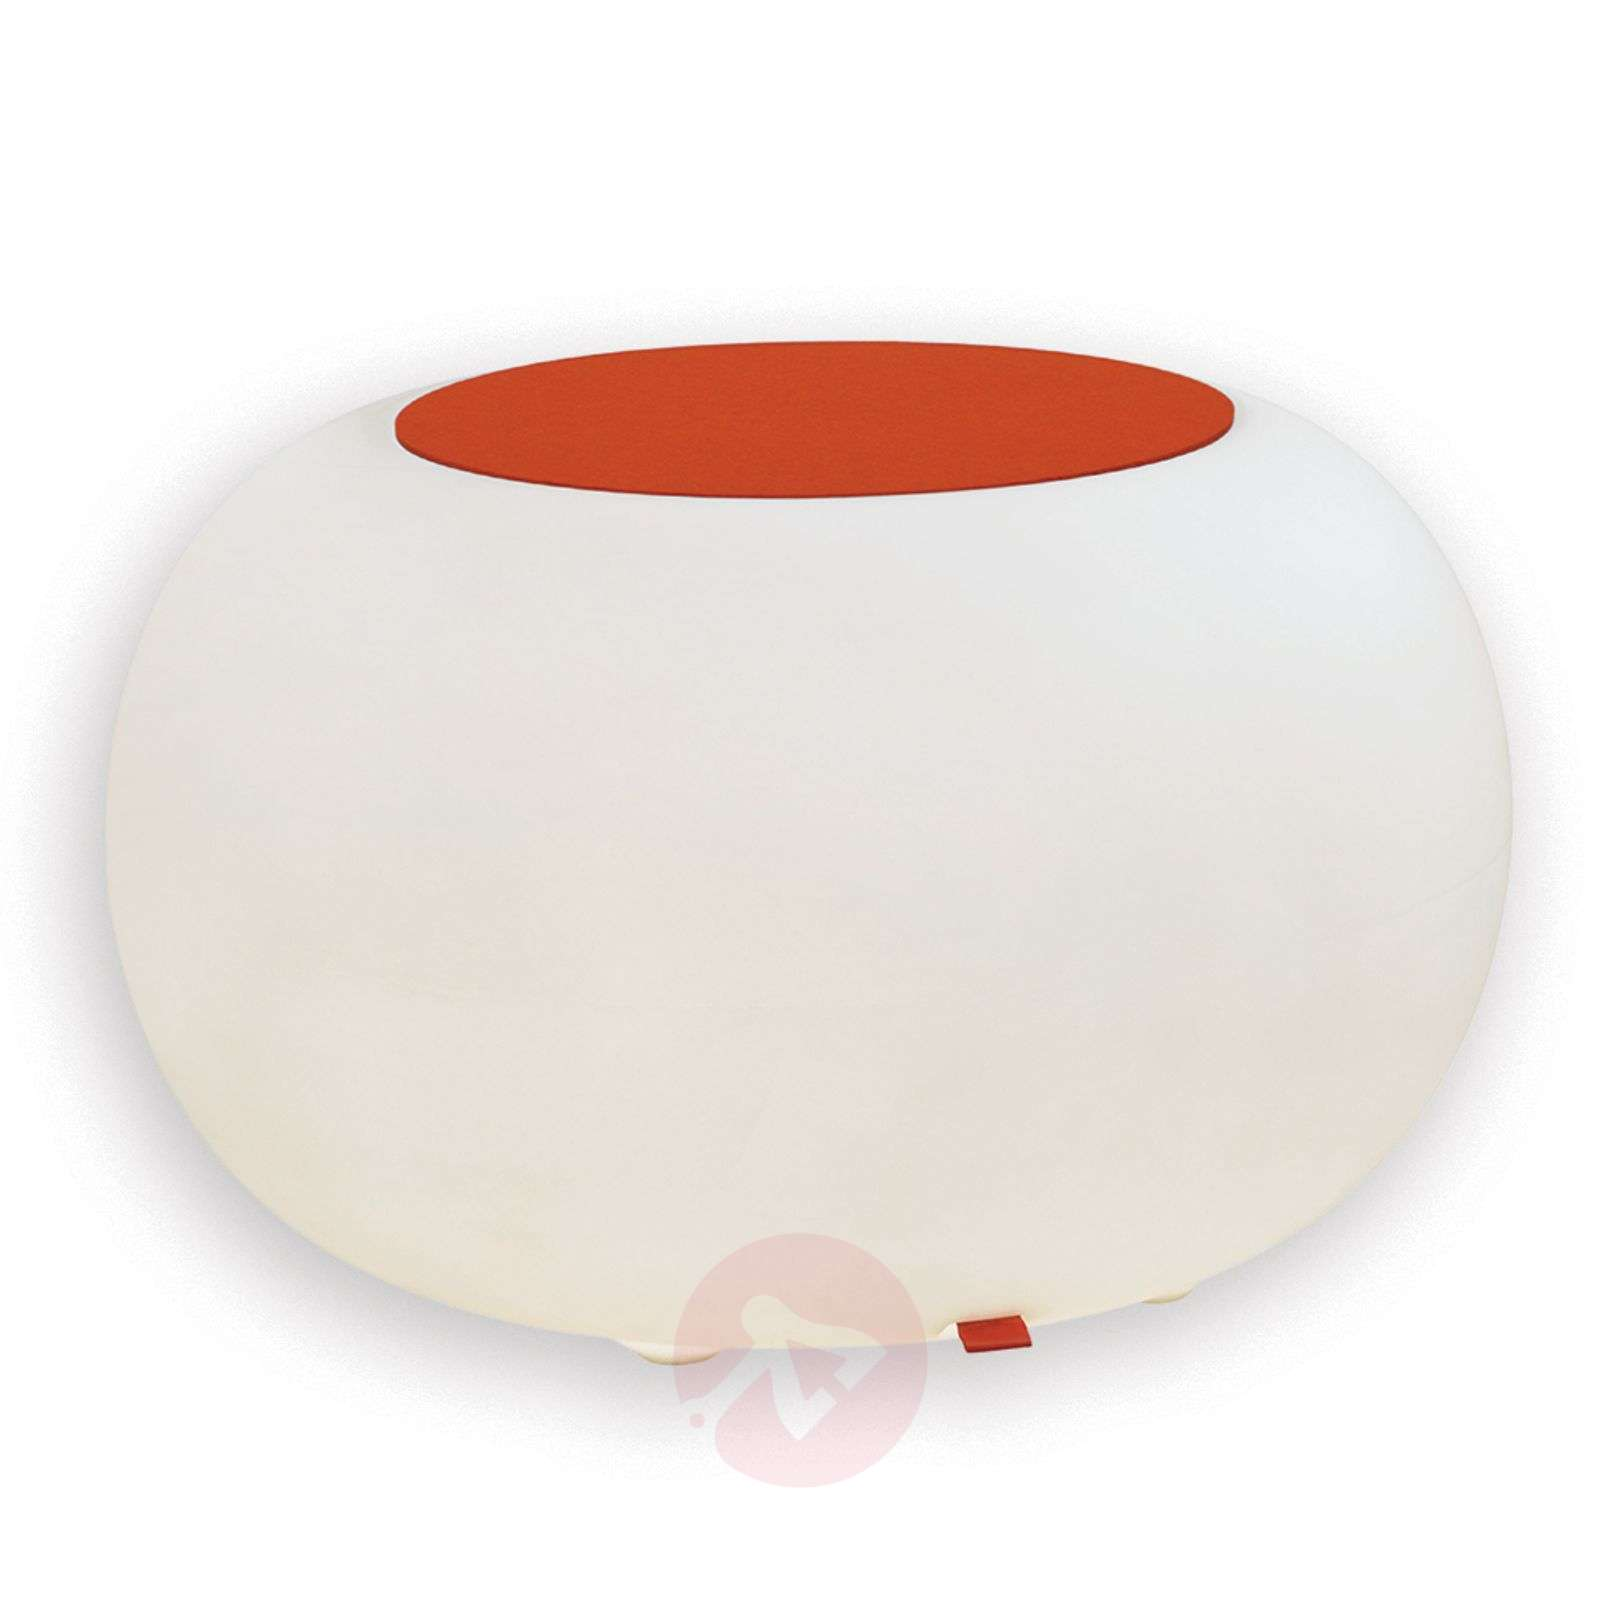 Table BUBBLE Indoor LED white light + orange felt-6537053-01